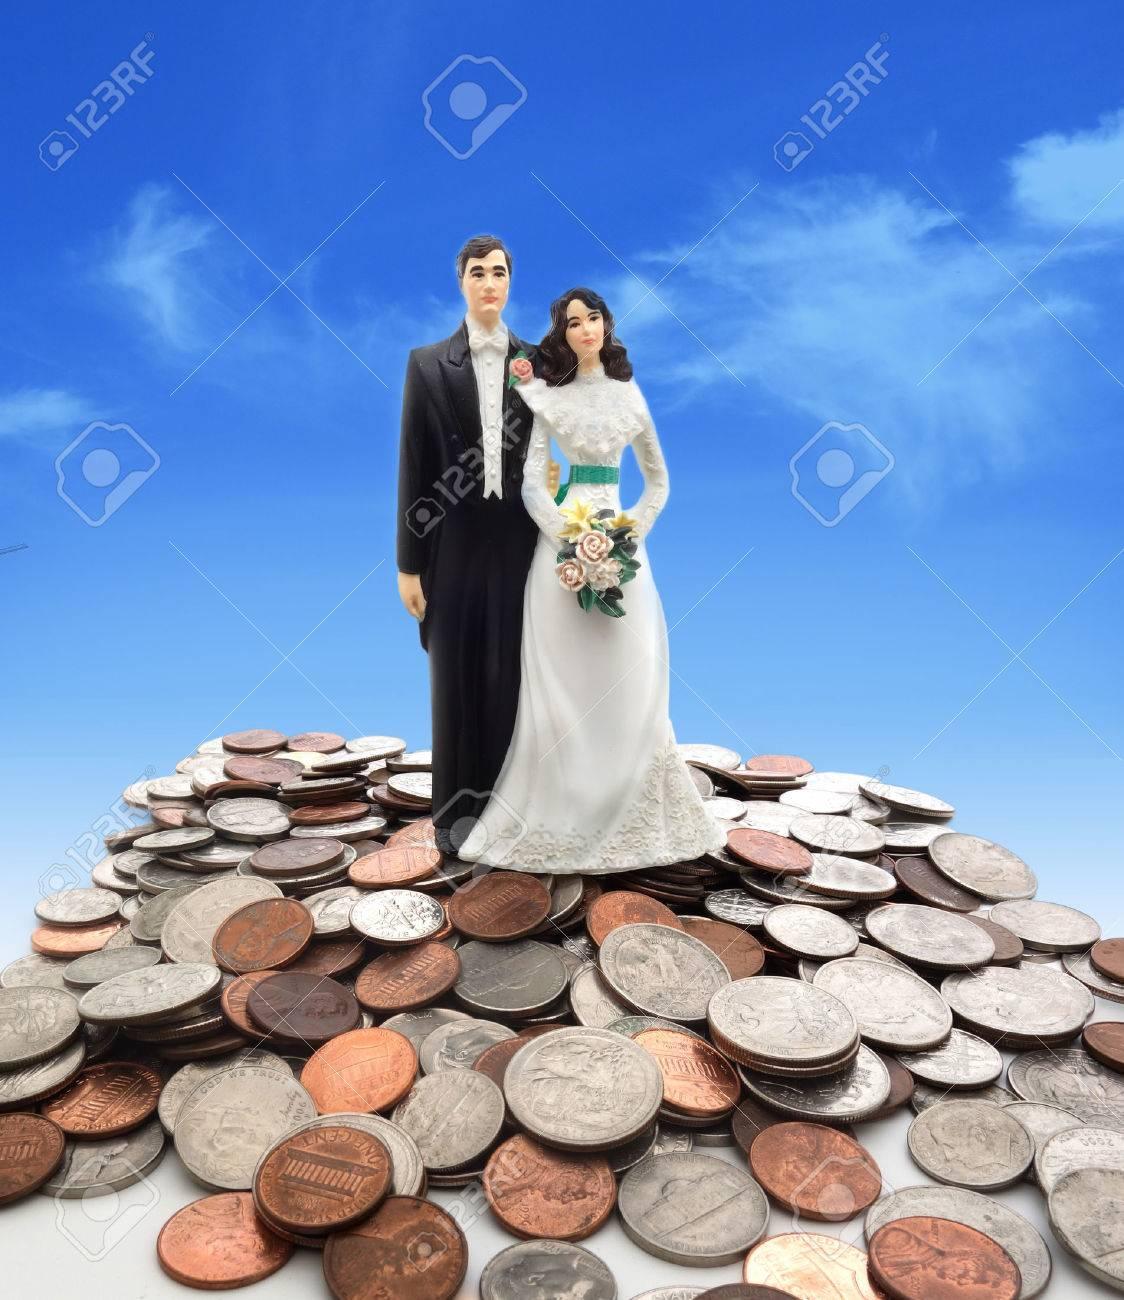 Plastic wedding couple on coins - money concept - 33705255